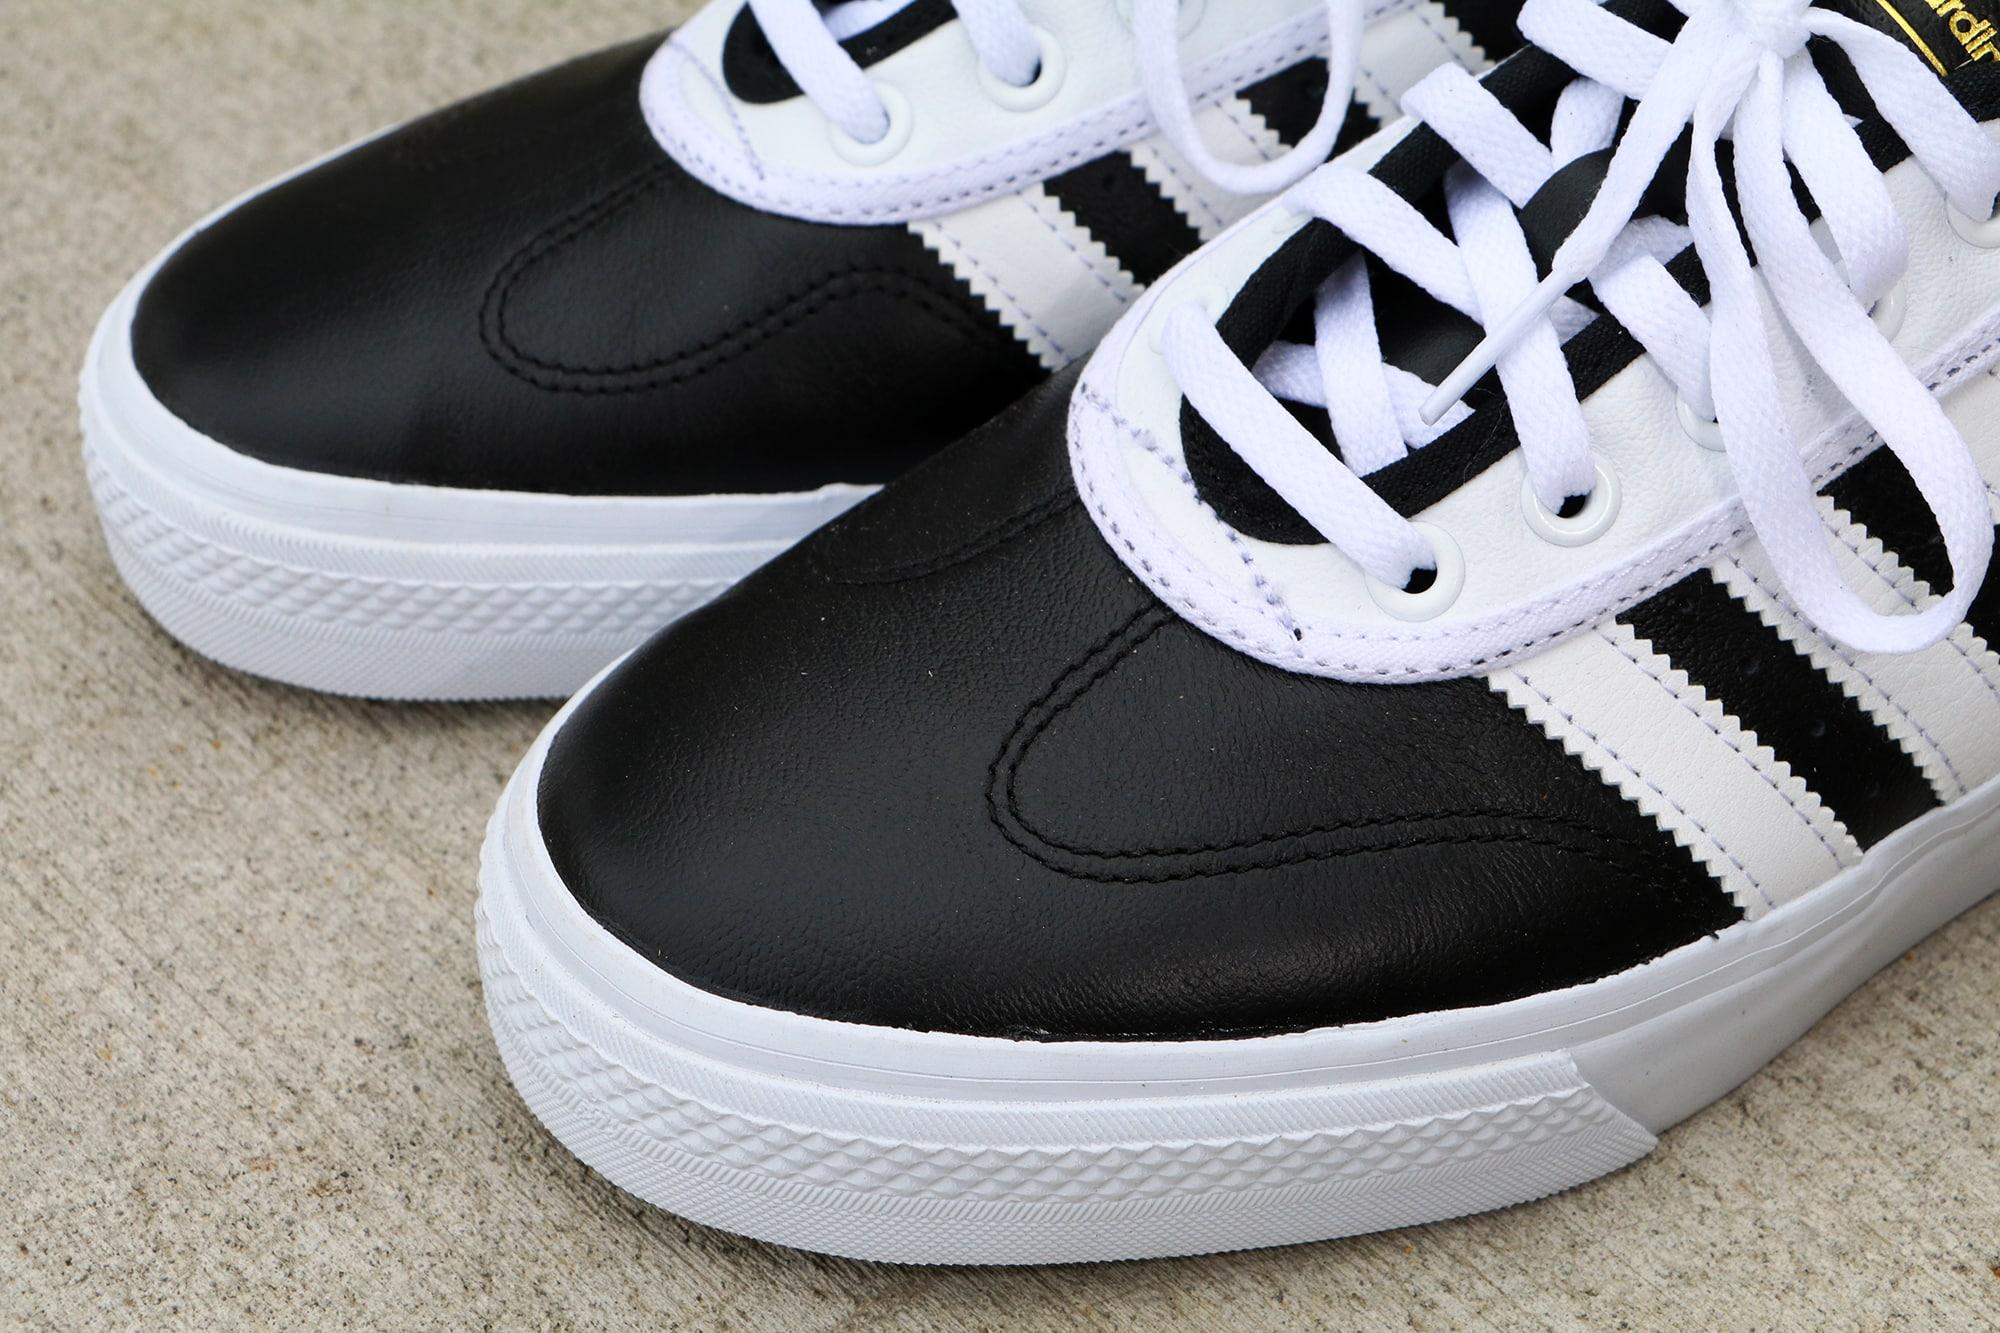 Adidas Adi Ease Premiere Universal Skate Shoes Tactics